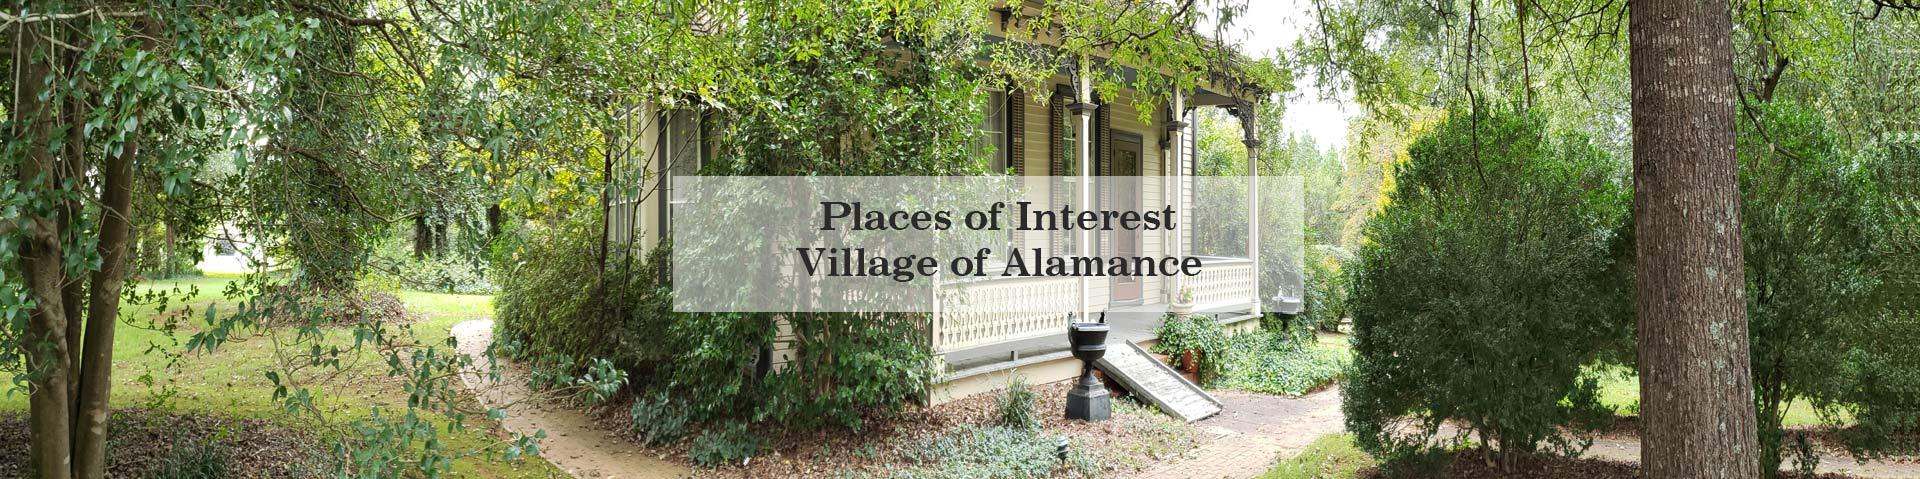 Village of Alamance Places of Interest